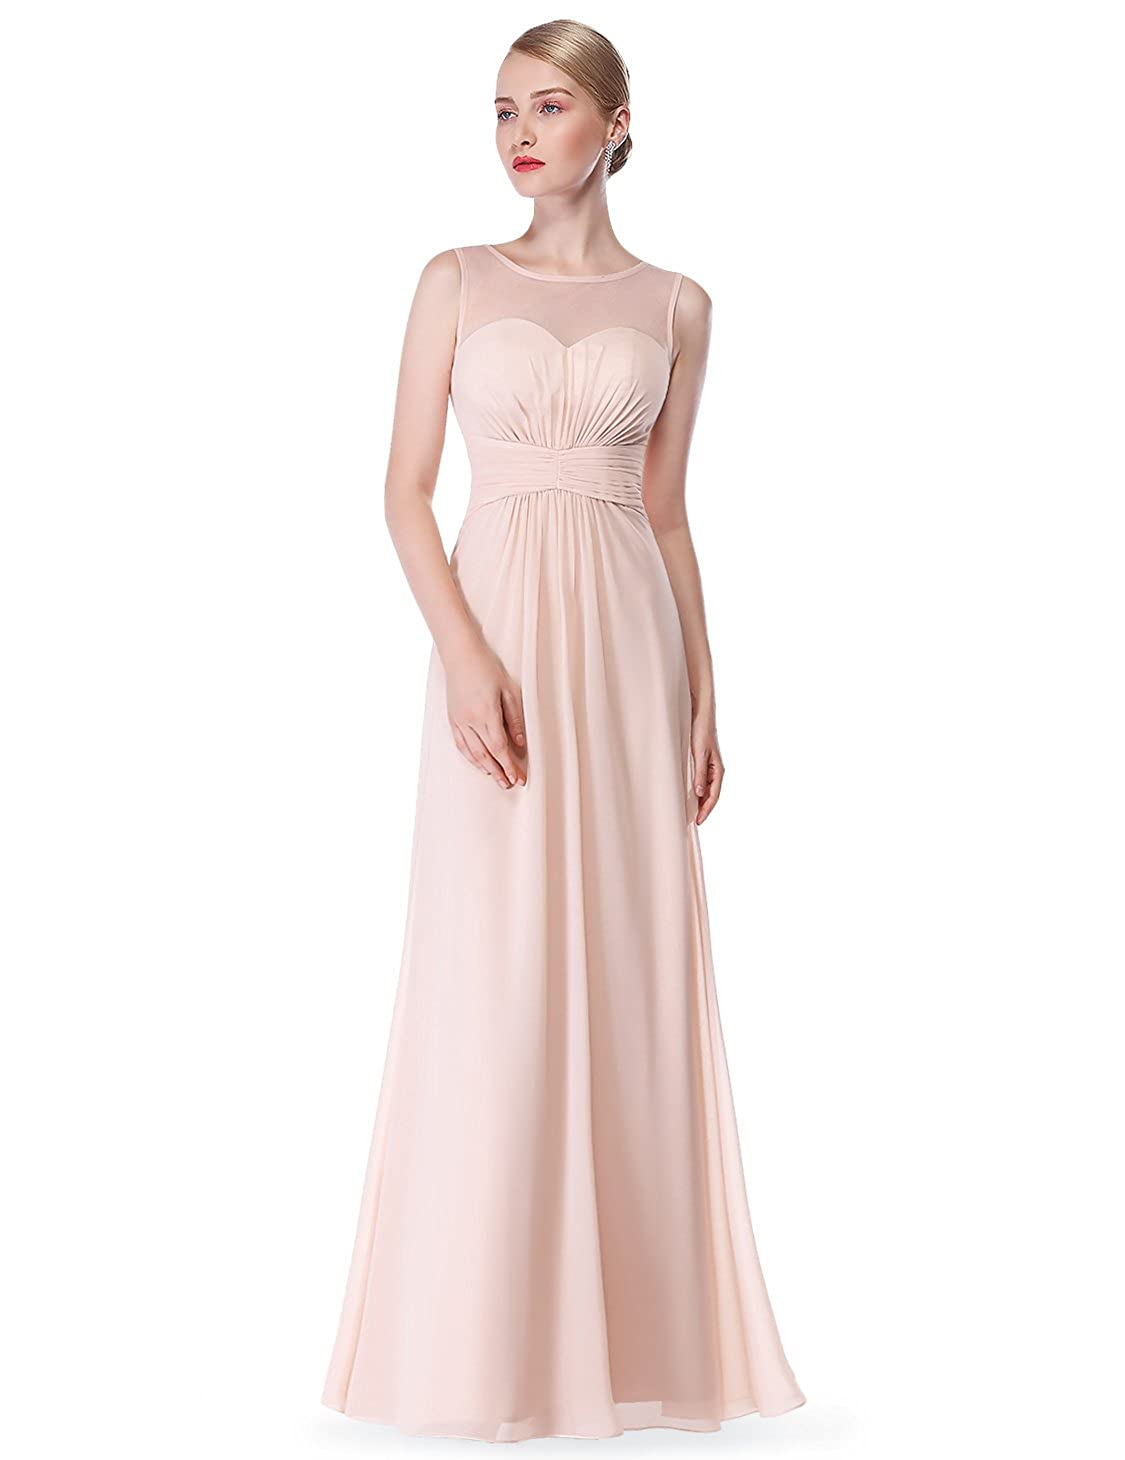 4d7855b955 Ever-Pretty Women's Elegant Long Evening Party Dress 08761 at Amazon Women's  Clothing store: